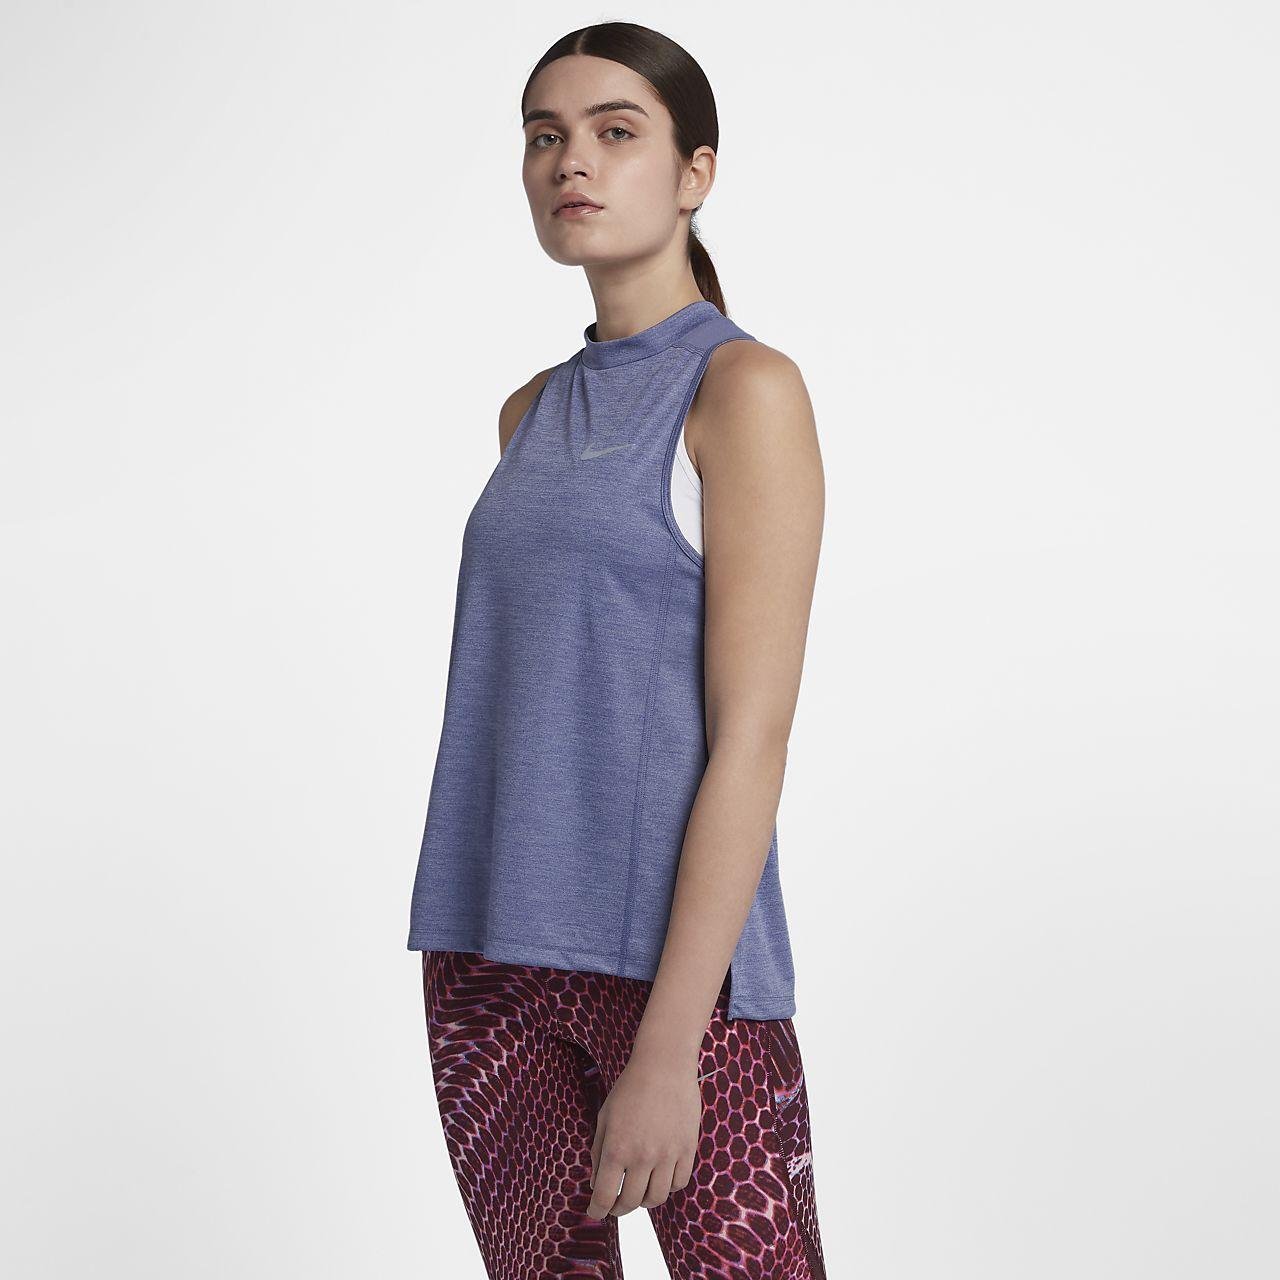 194cbf3f829fca Nike Dri Fit Miler Sleeveless Run T Shirt Mens - BCD Tofu House